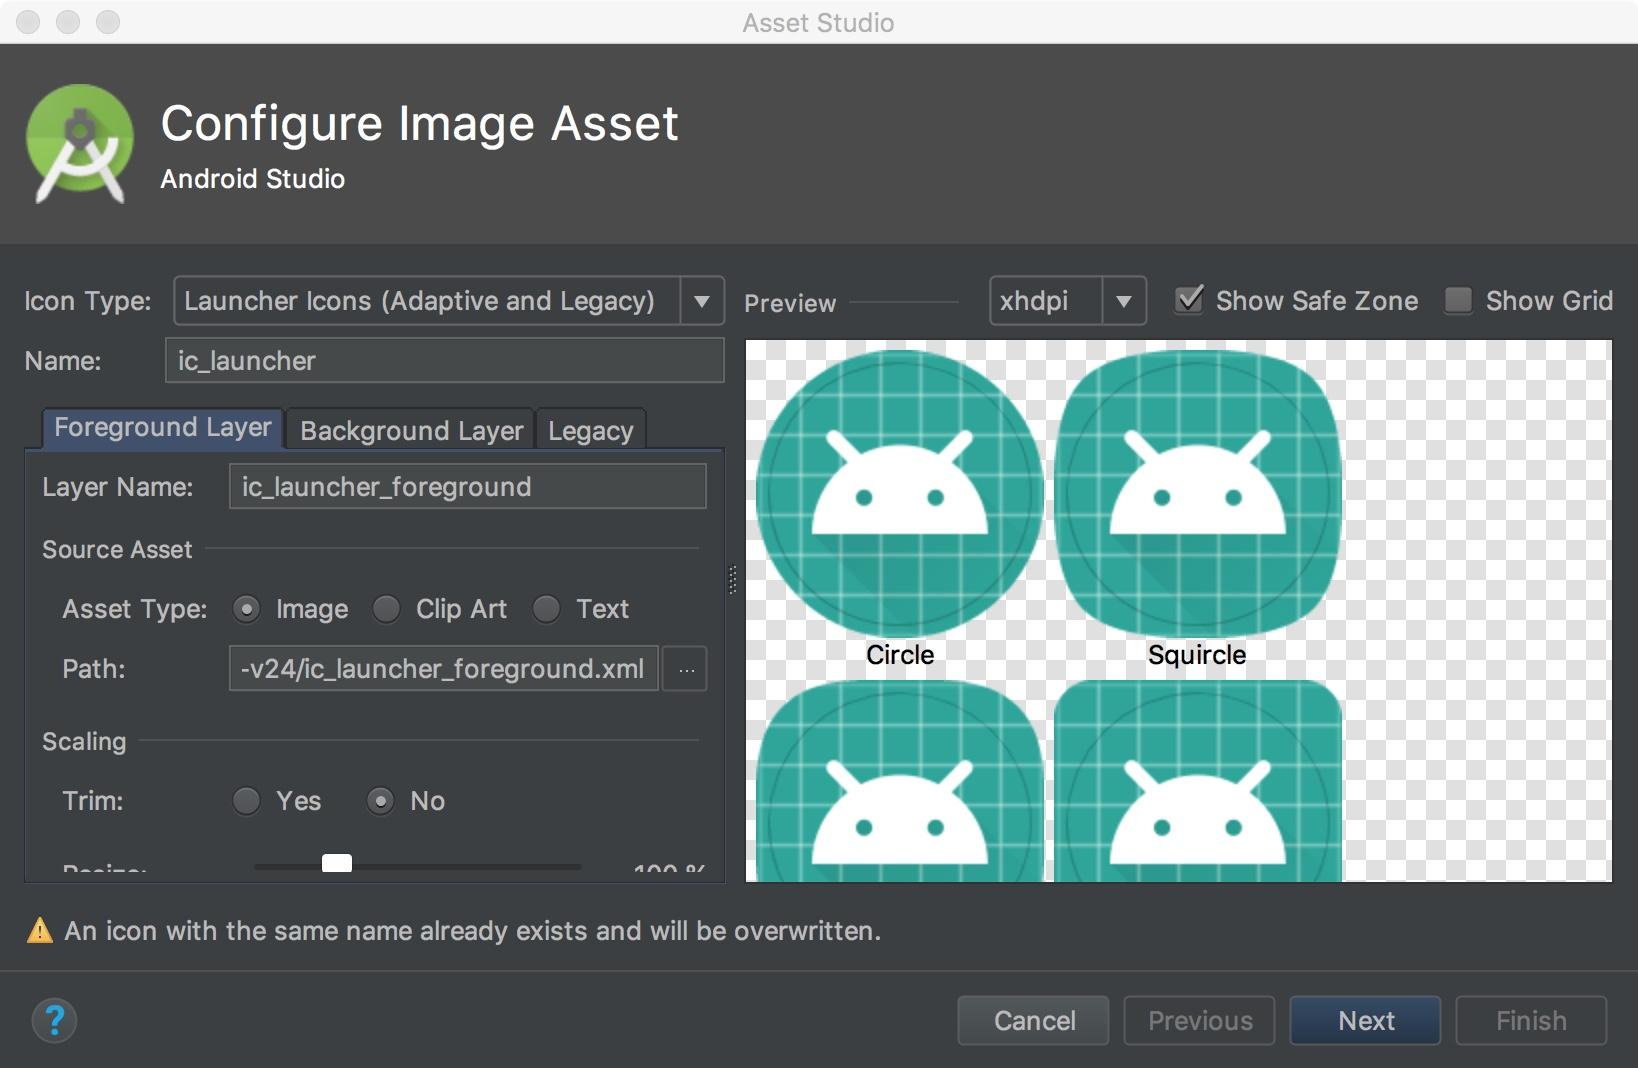 Ventana Configure Image Asset